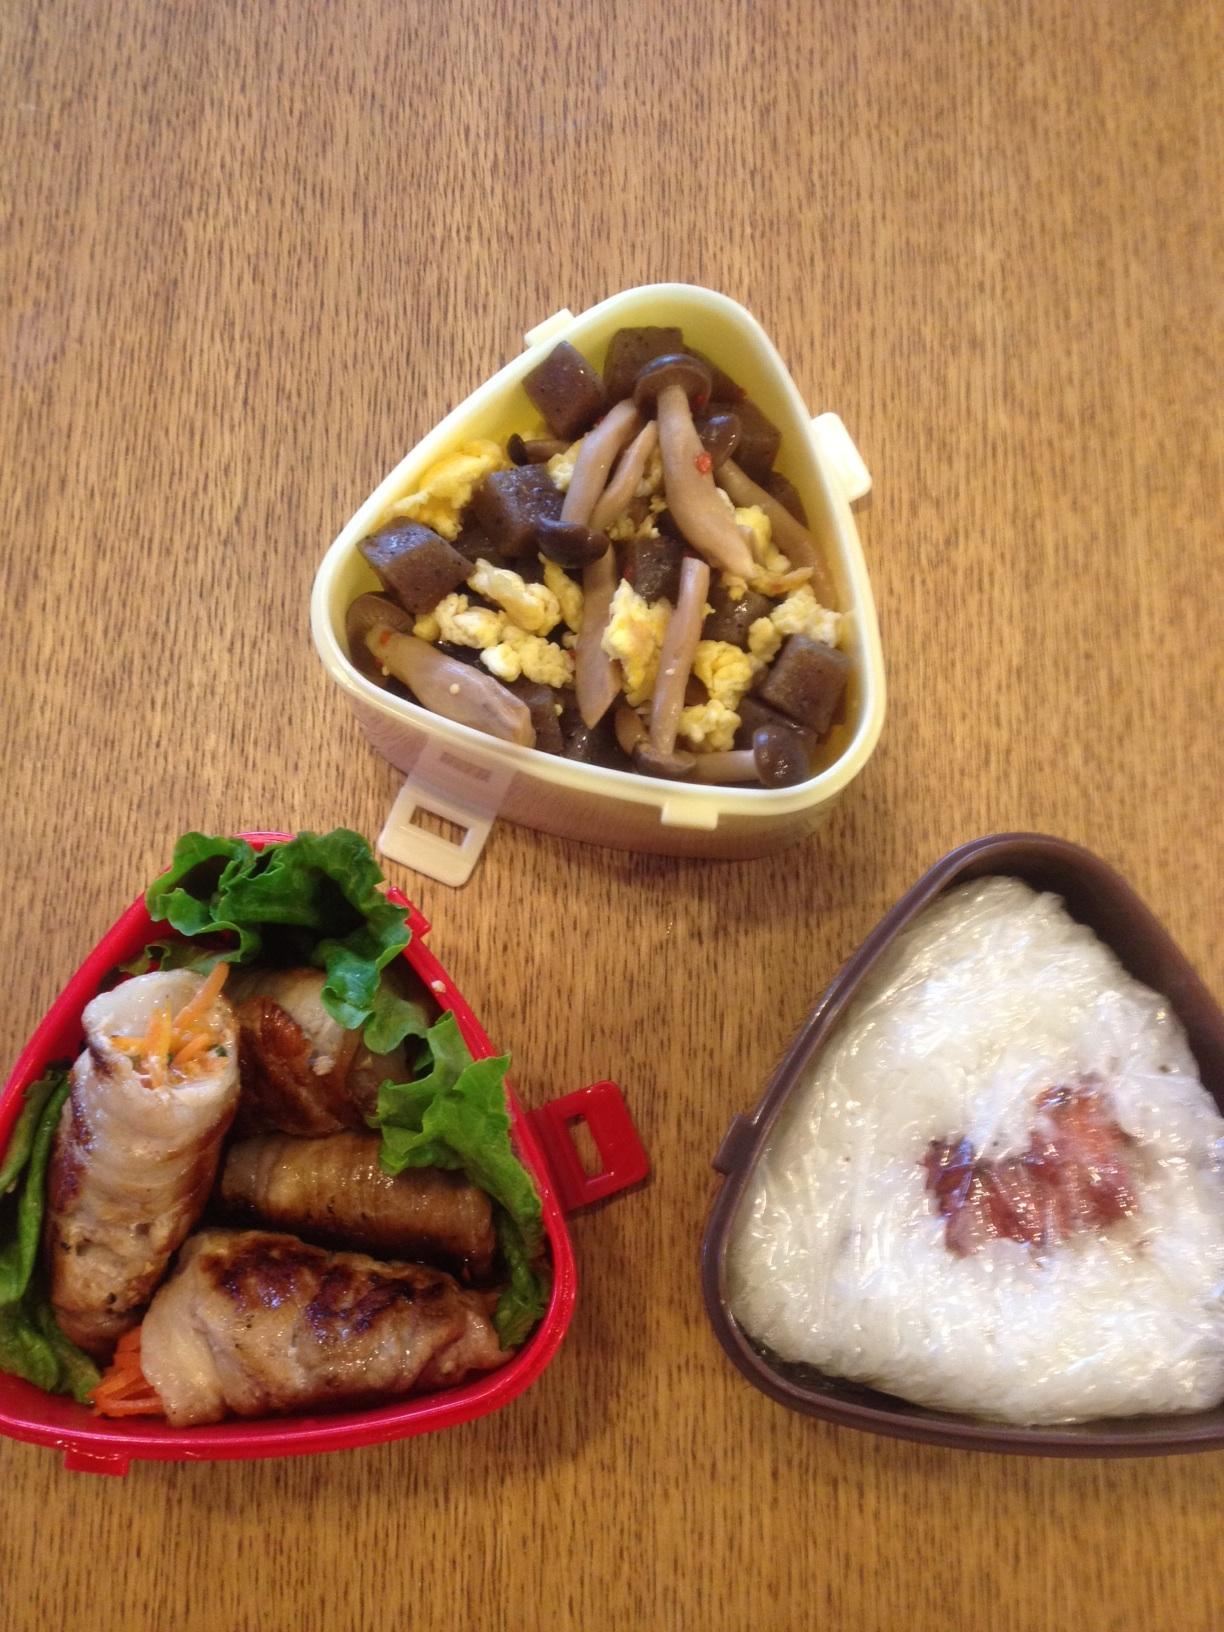 http://sorakikaku.com/maruyamamiki/files/0316.jpg